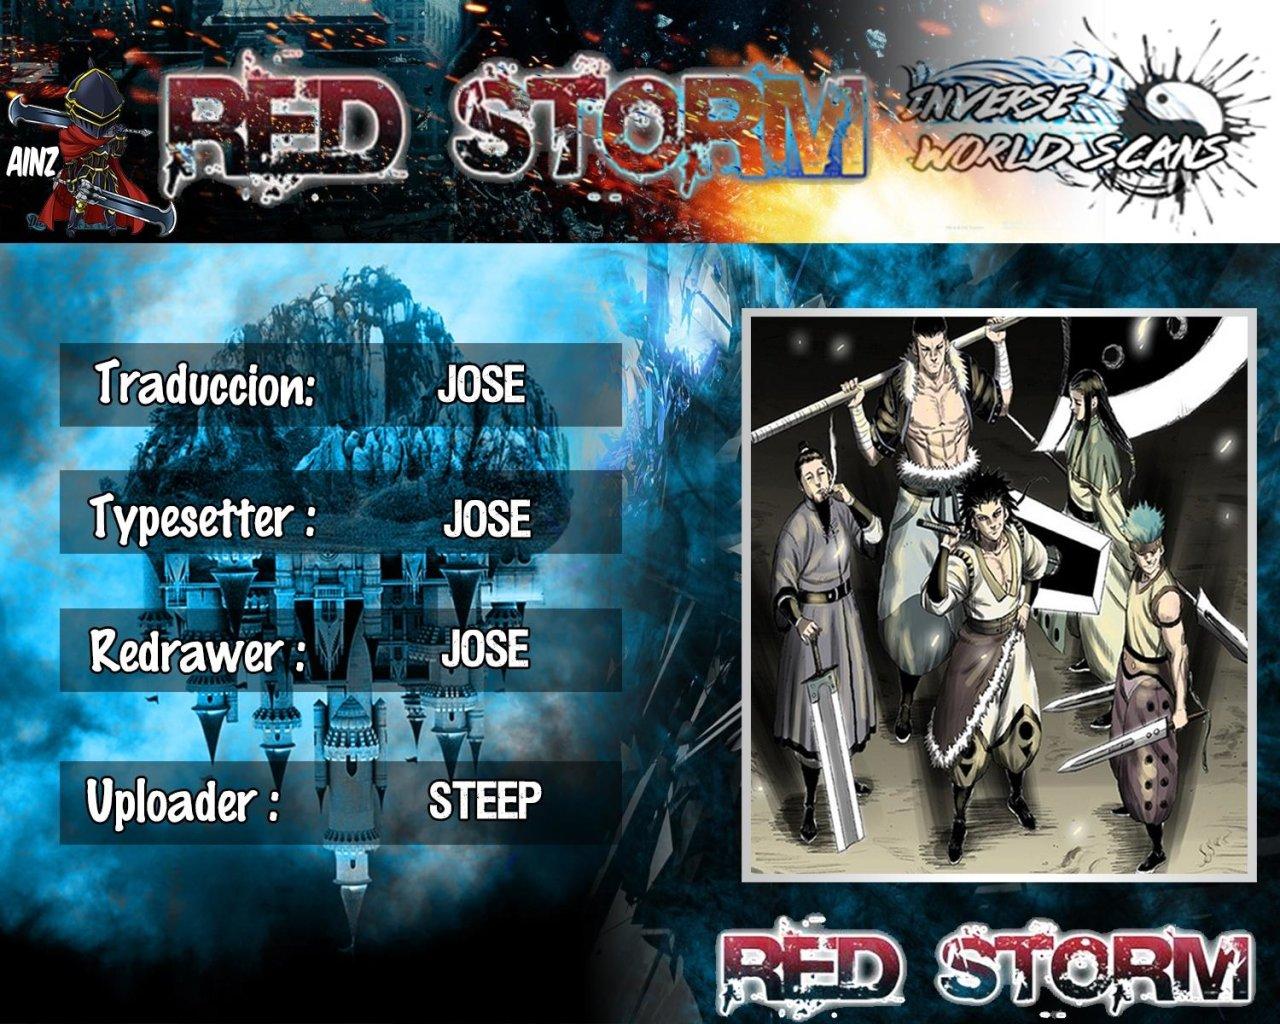 https://c10.mangatag.com/es_manga/pic5/10/14602/770778/4e093aa7417fe0881bc5fbda7322a74e.jpg Page 1